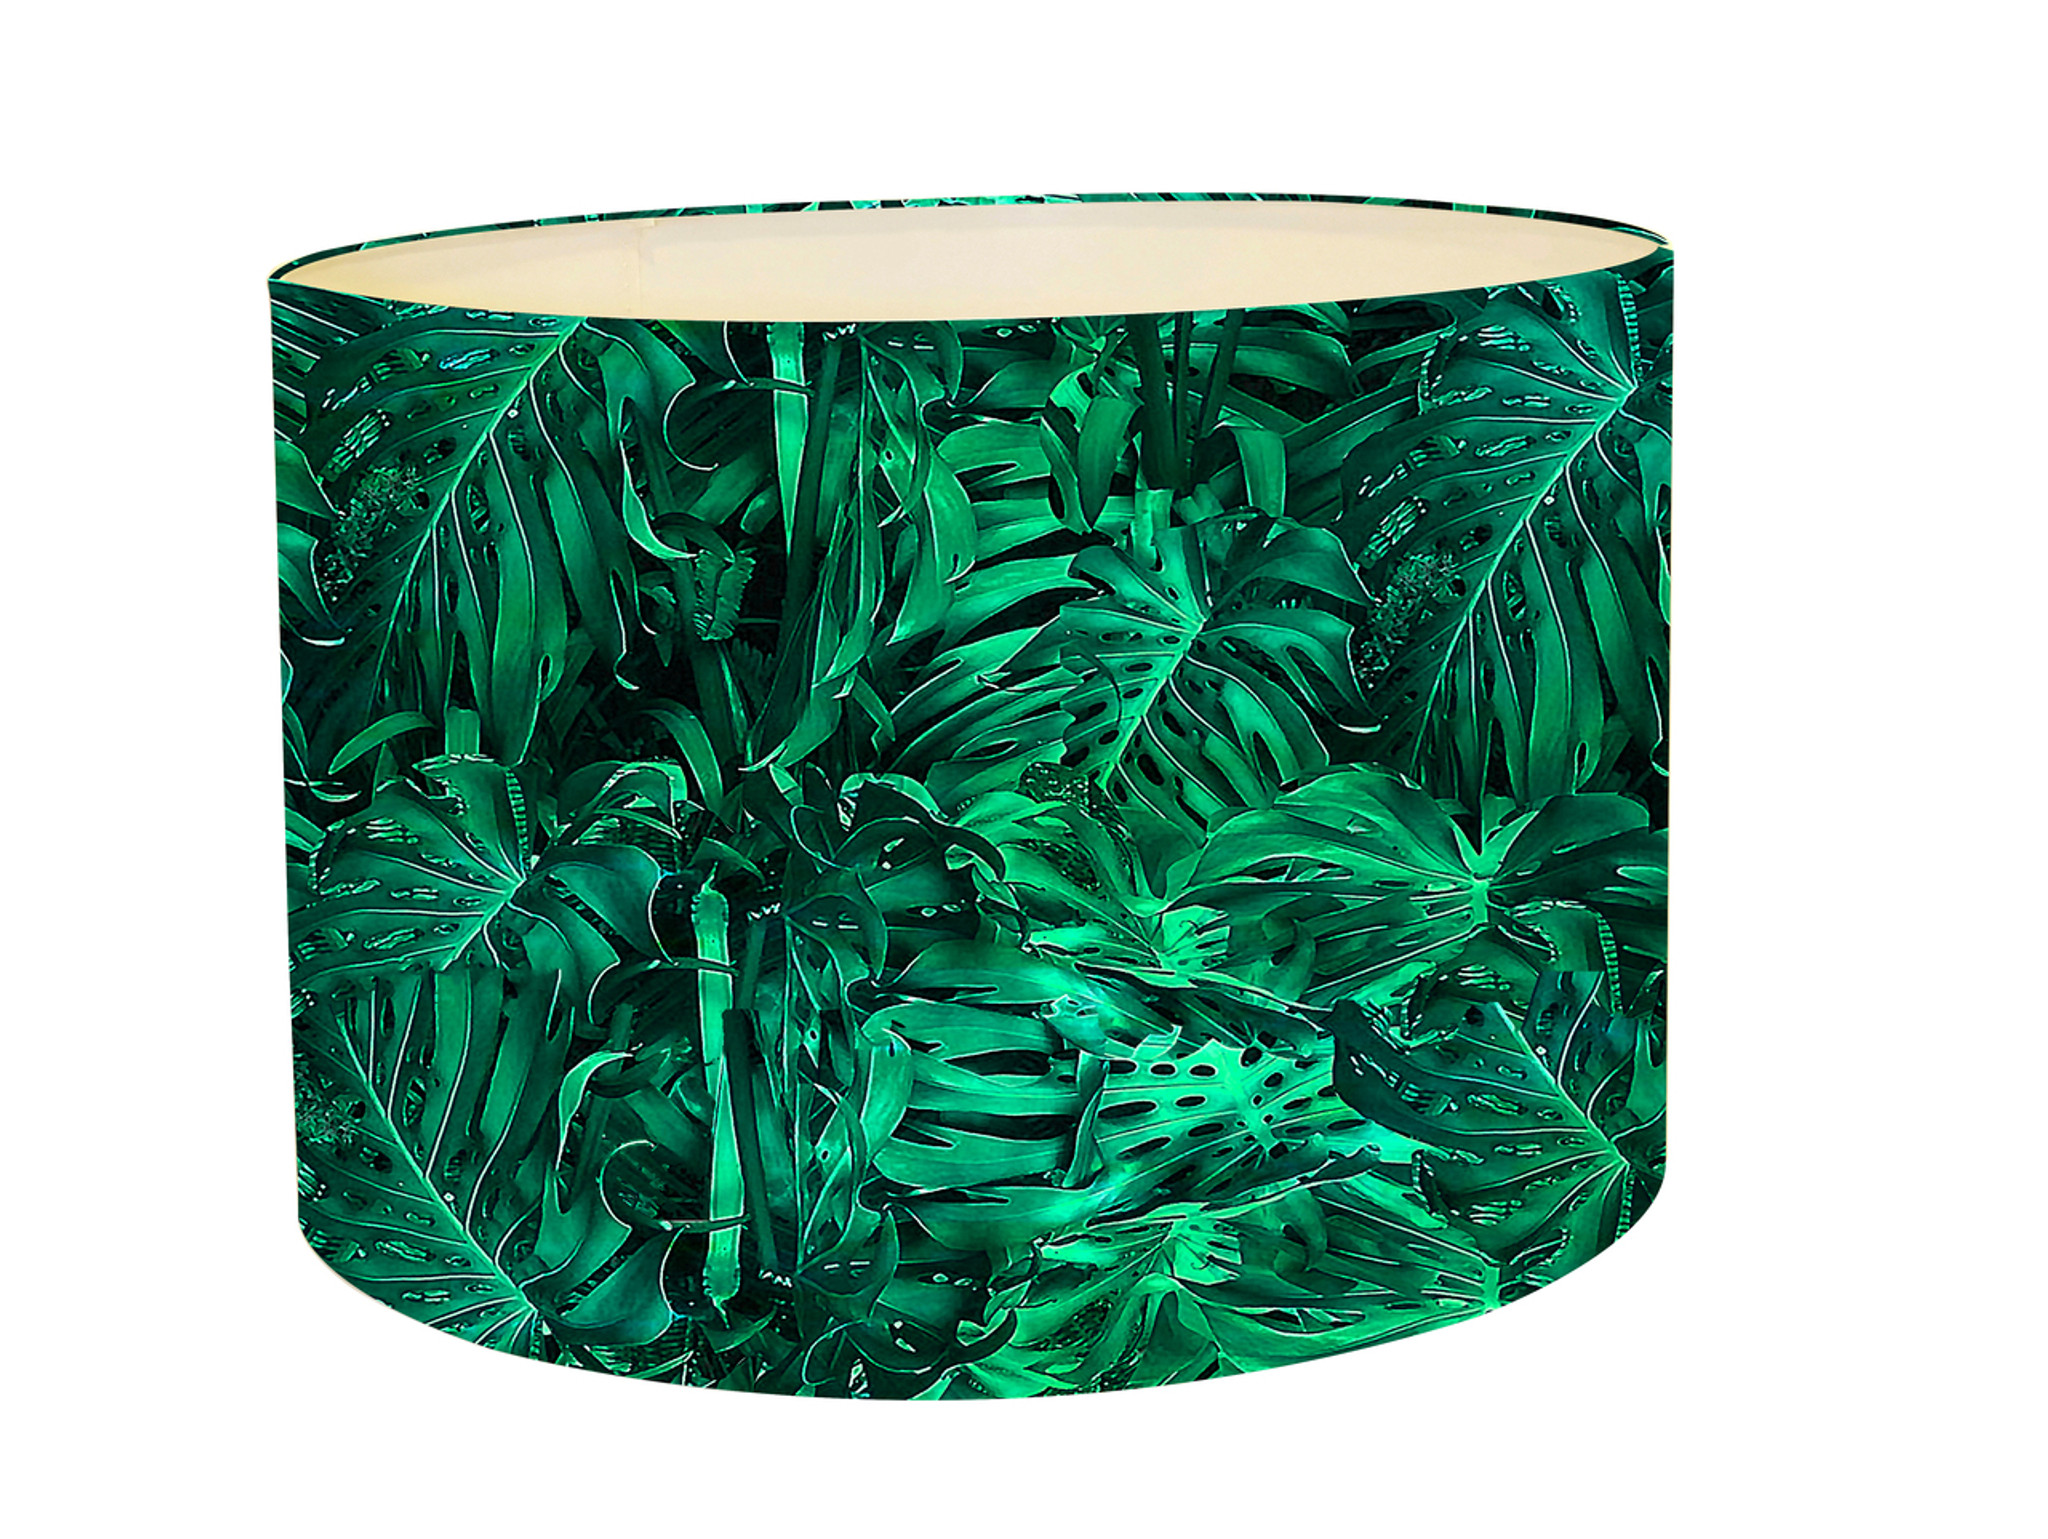 Lampshade - Jungle Vibe - Metallic green